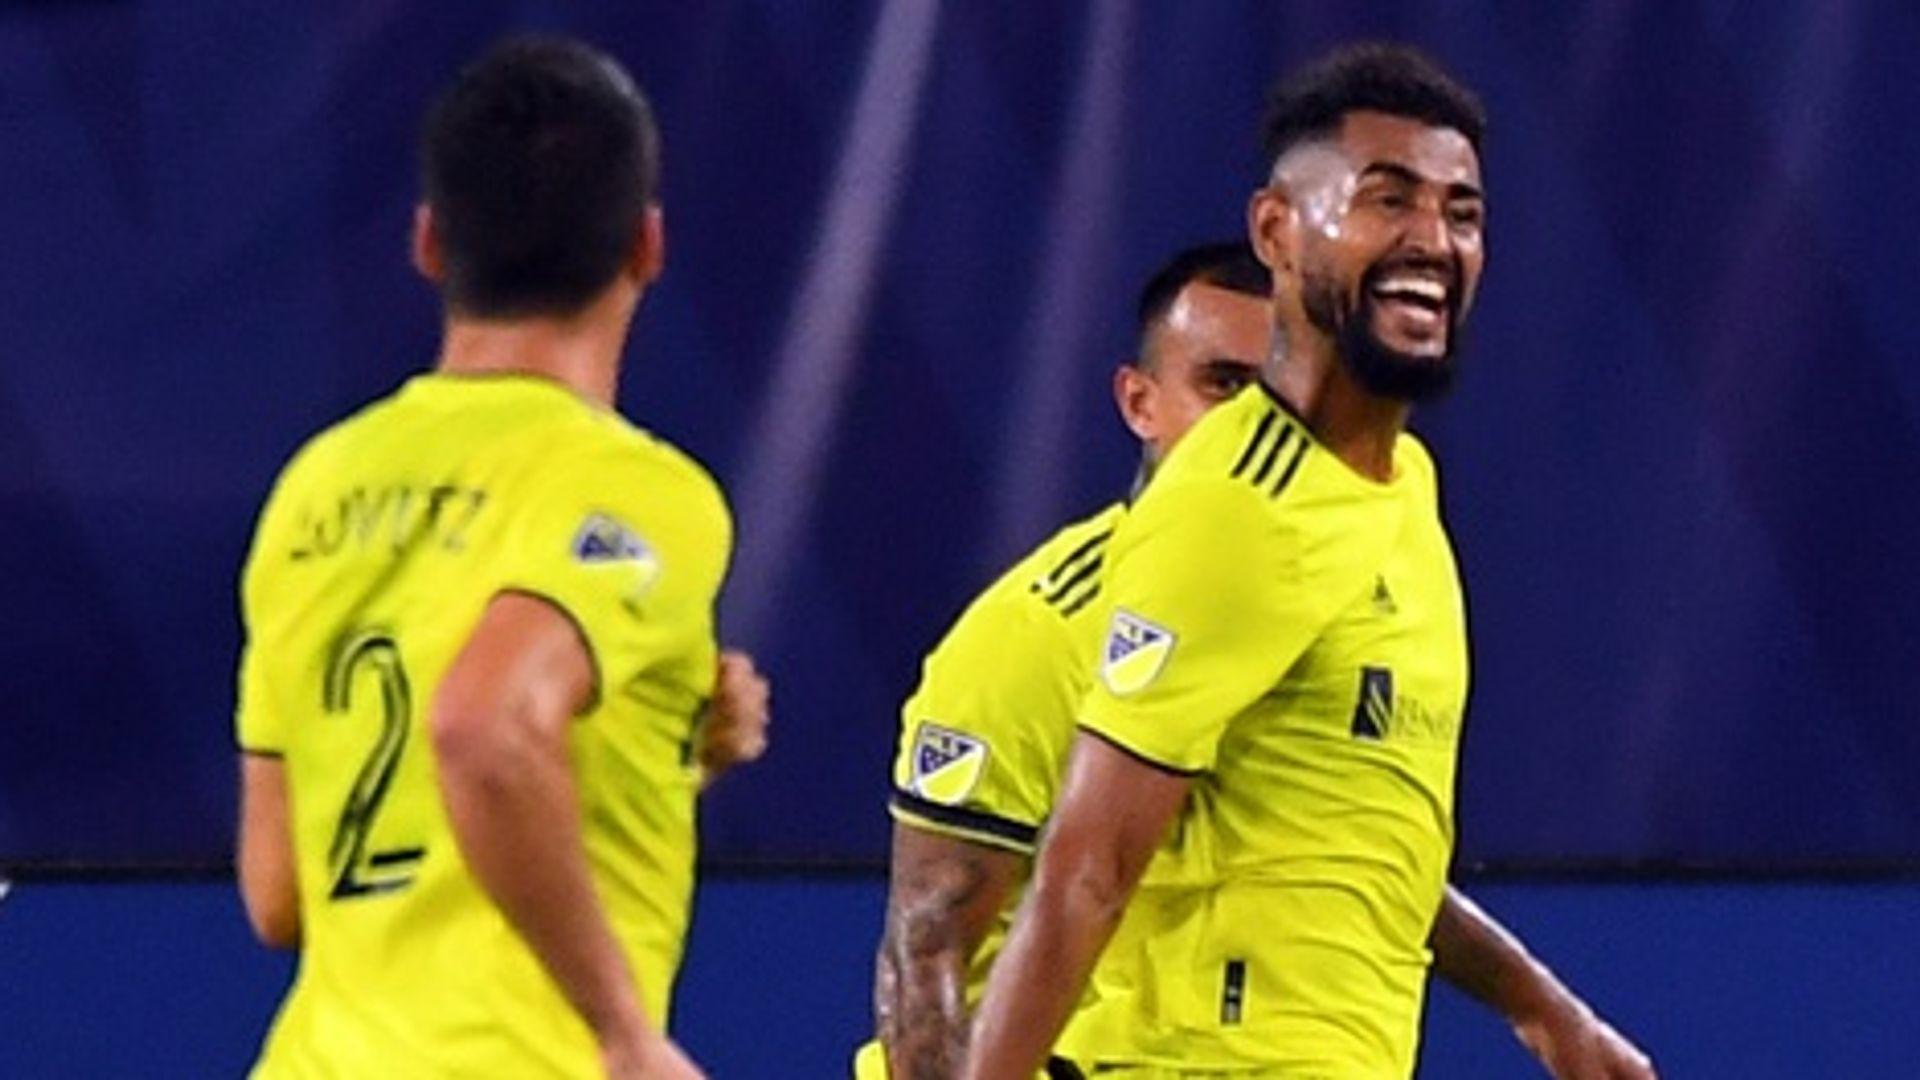 MLS: Becks' Inter beaten, Sounders on song